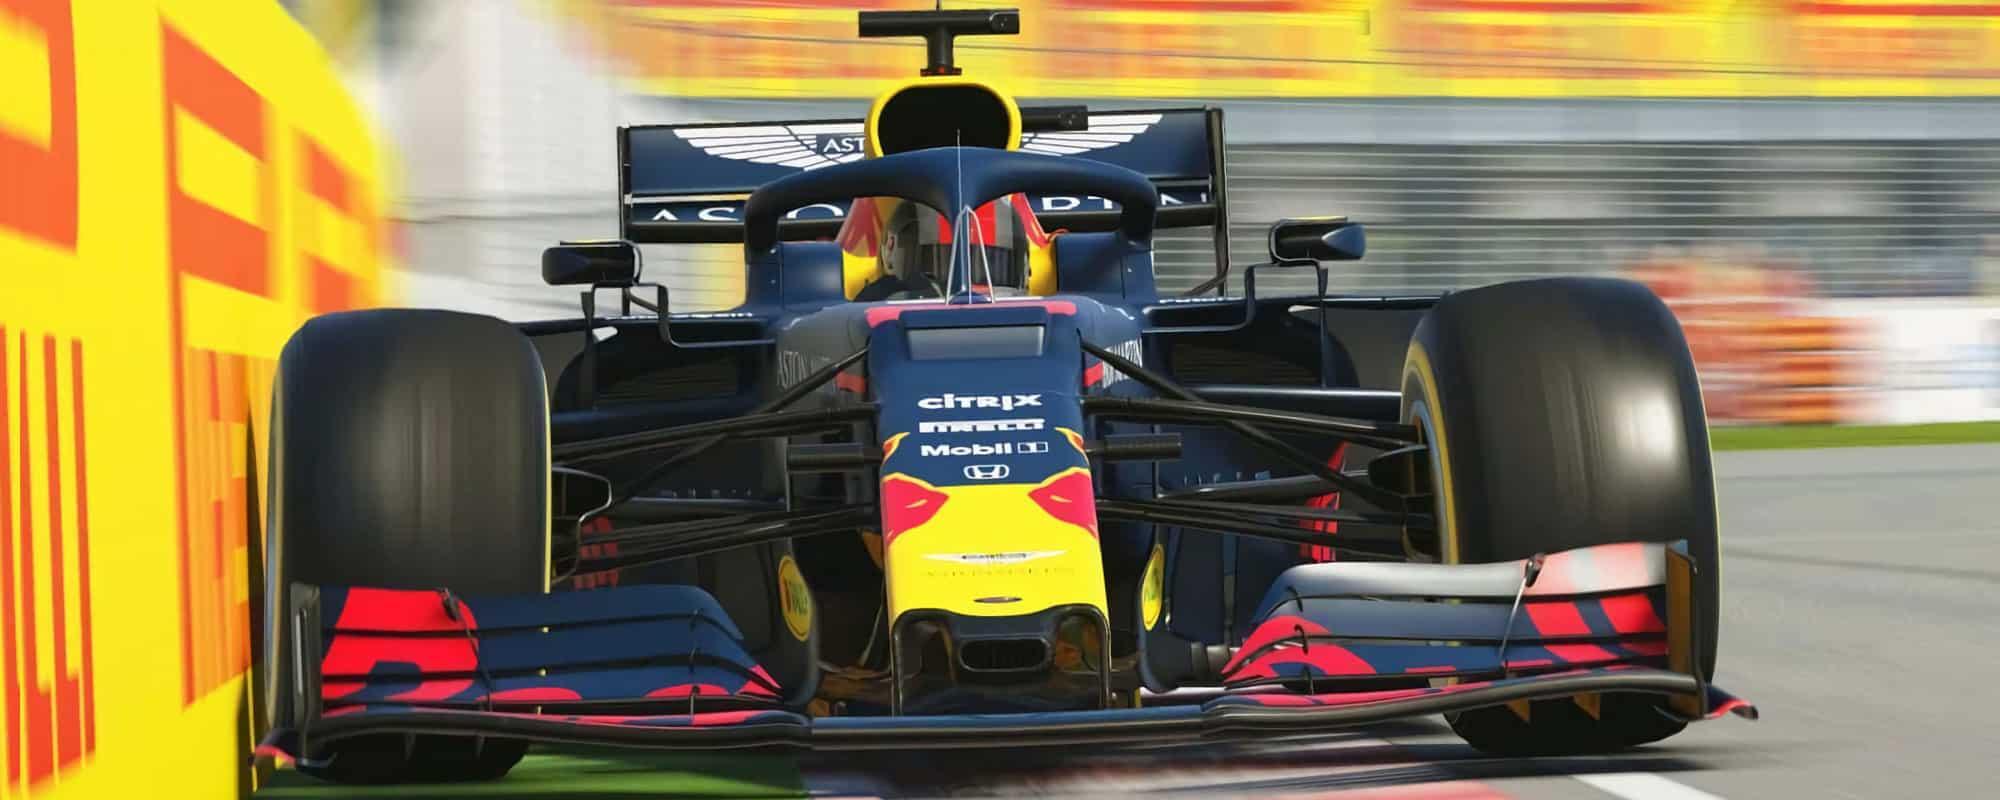 At T Aston Martin Red Bull Racing